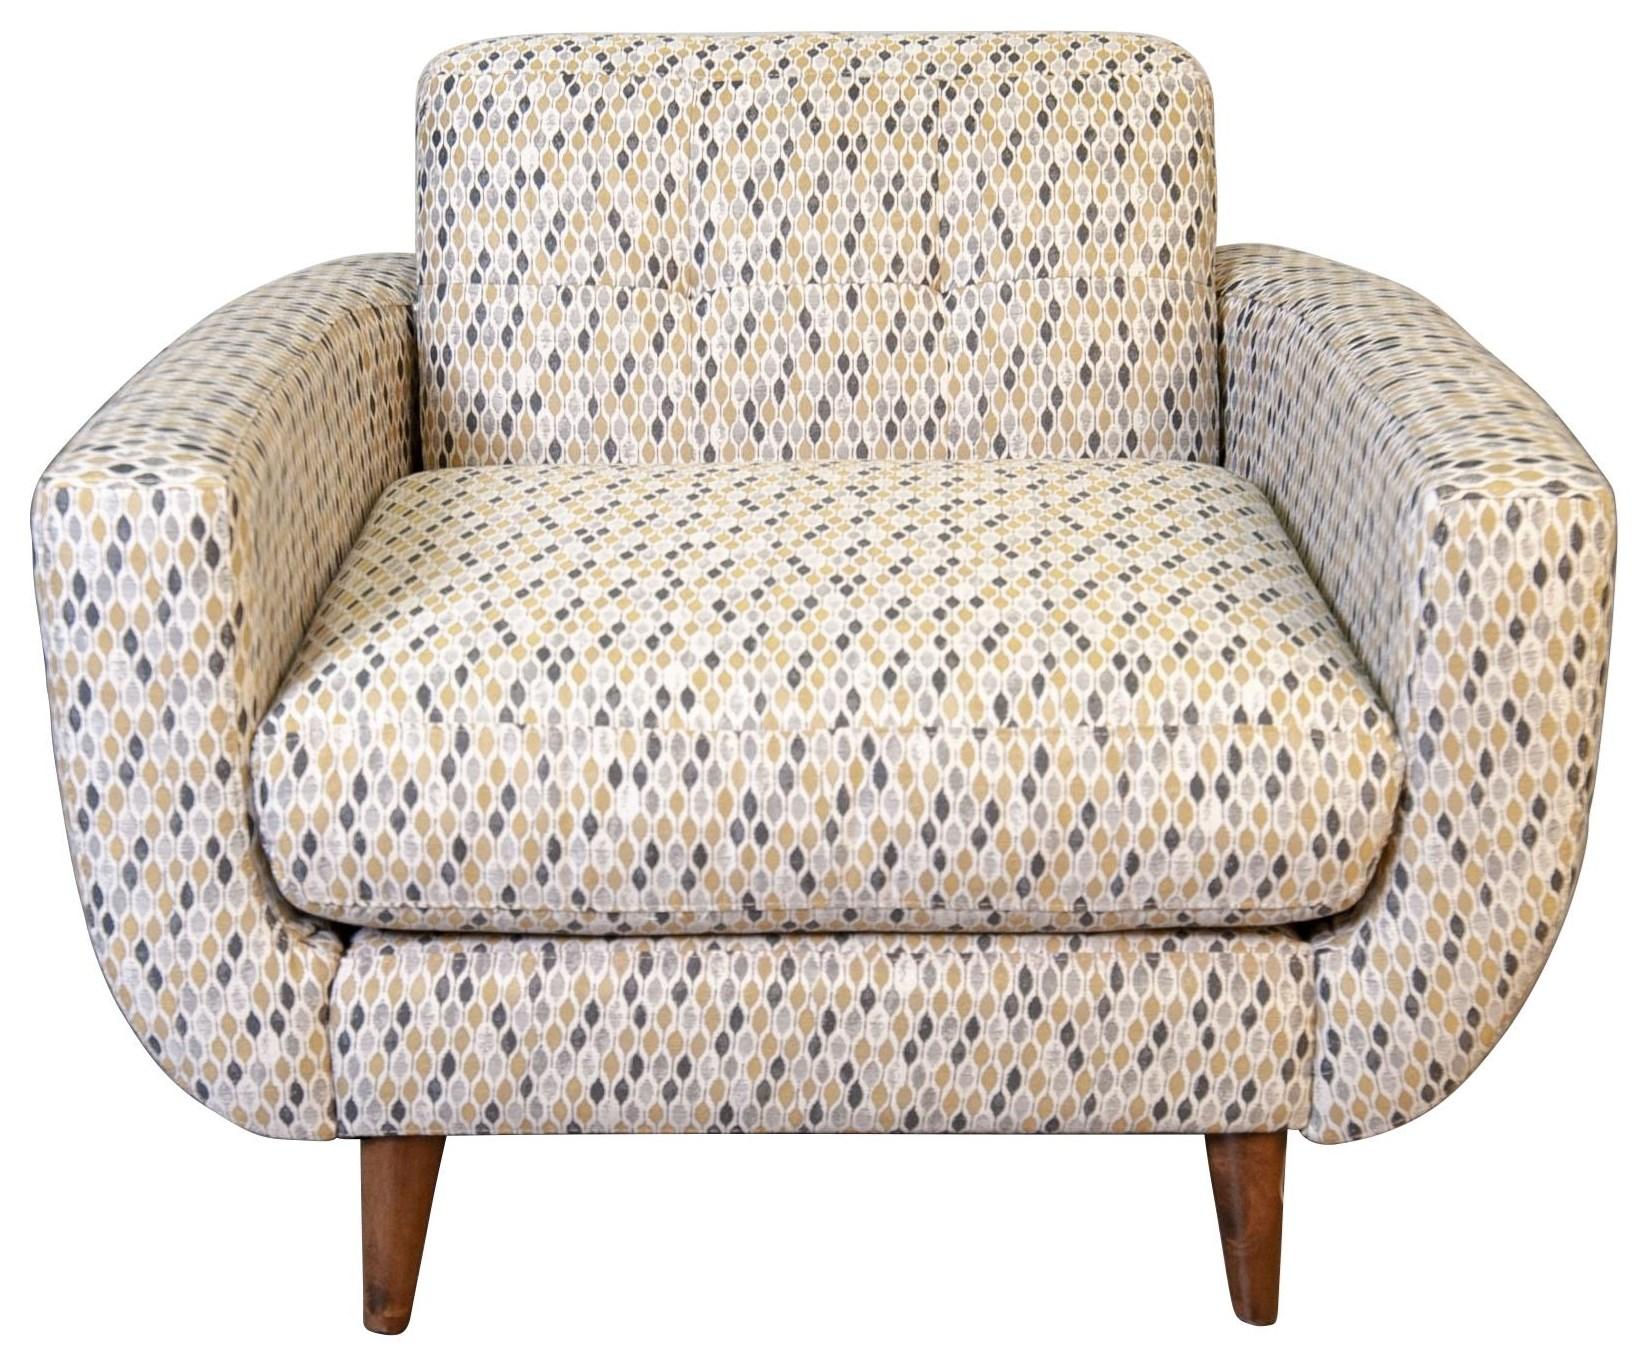 Bianca Bianca Arm Chair by Jonathan Louis at Morris Home